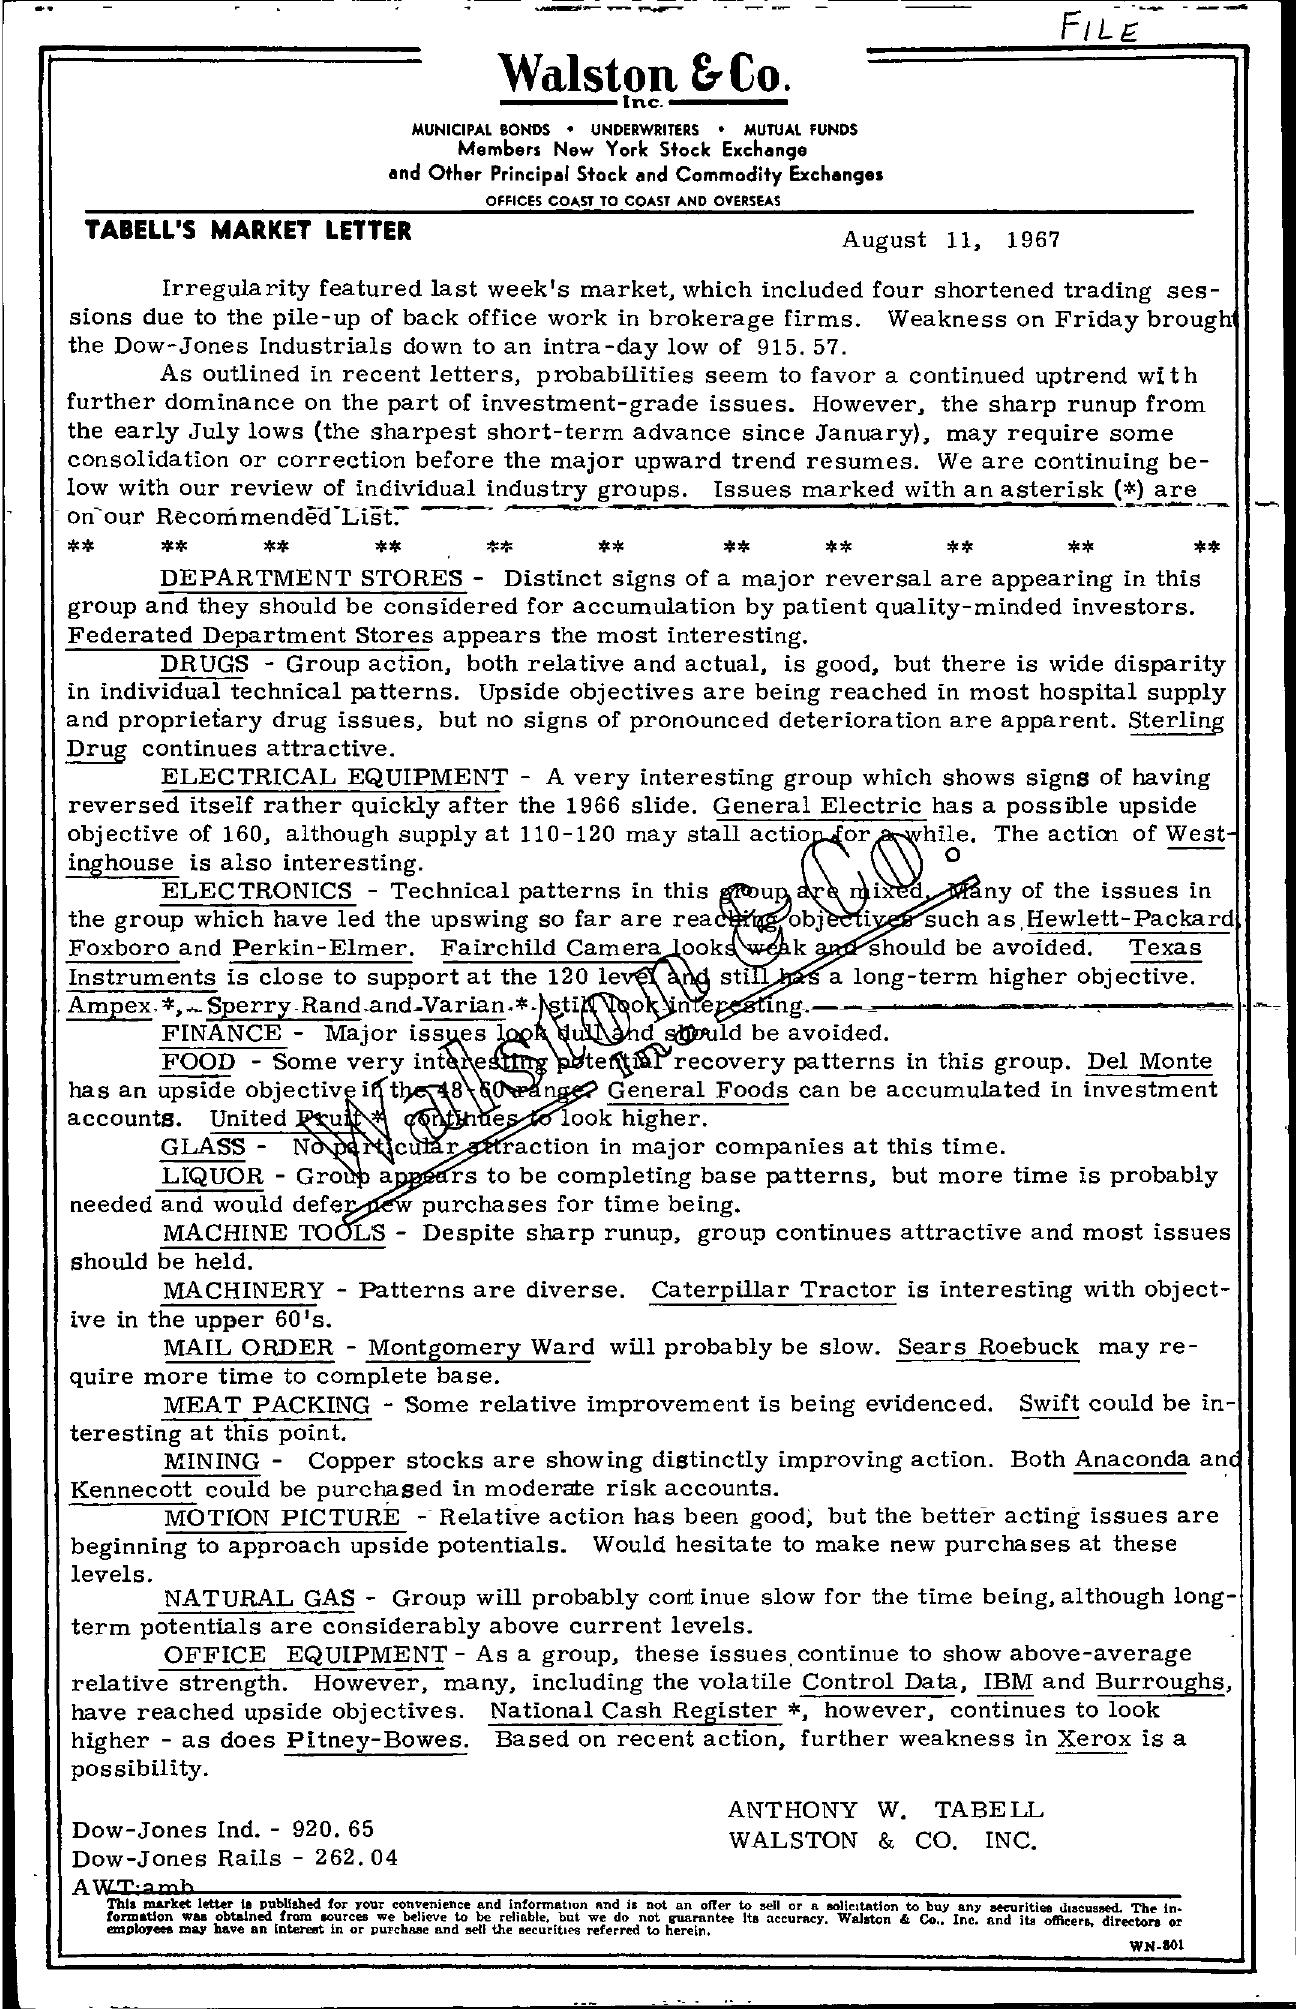 Tabell's Market Letter - August 11, 1967